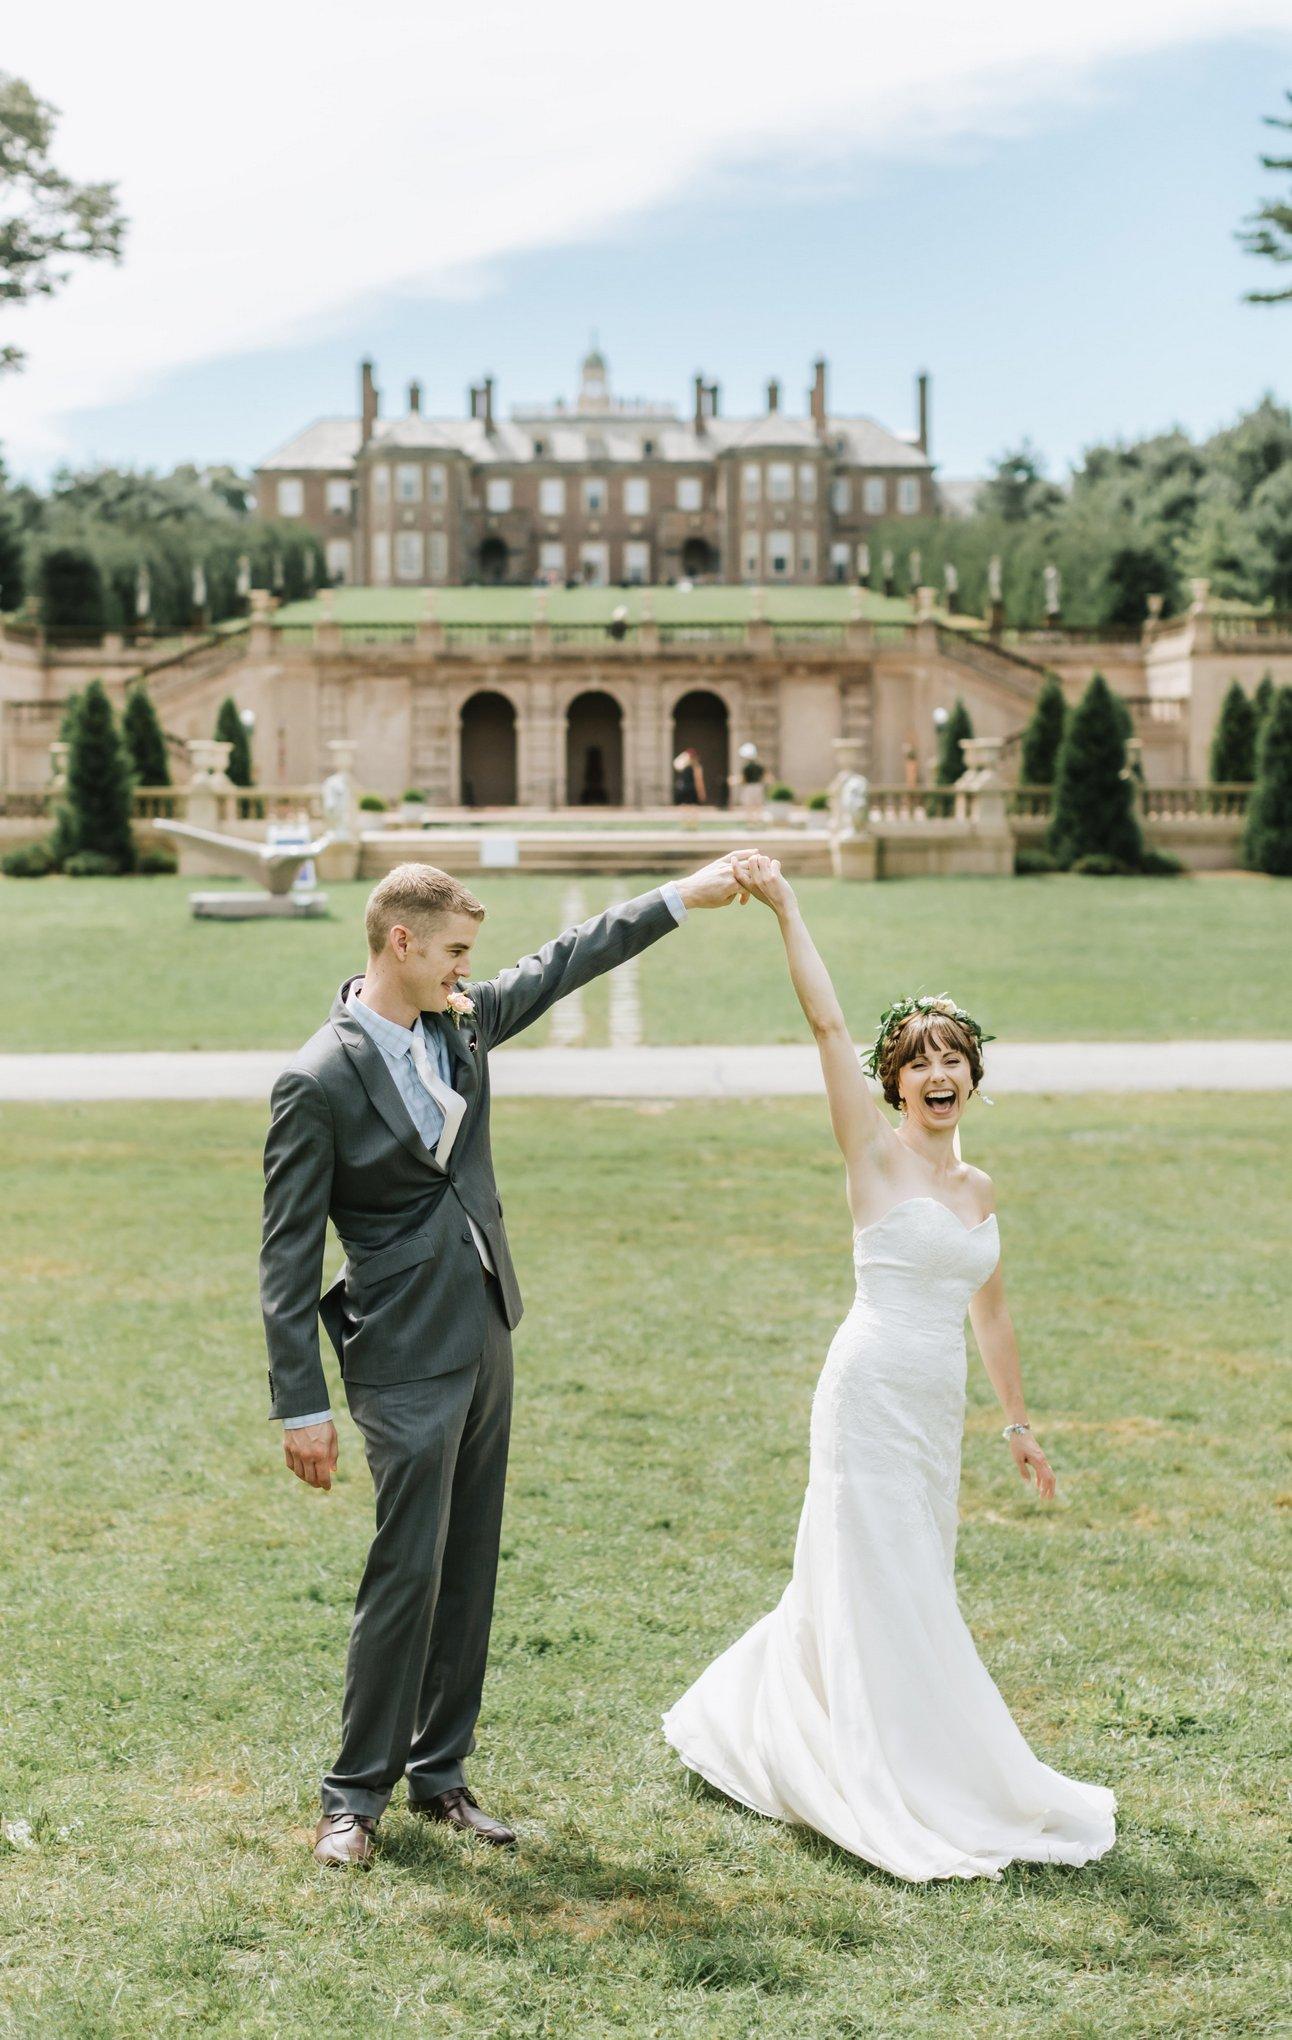 Crane-Estate-Vow-Renewal-Wedding-21.JPG